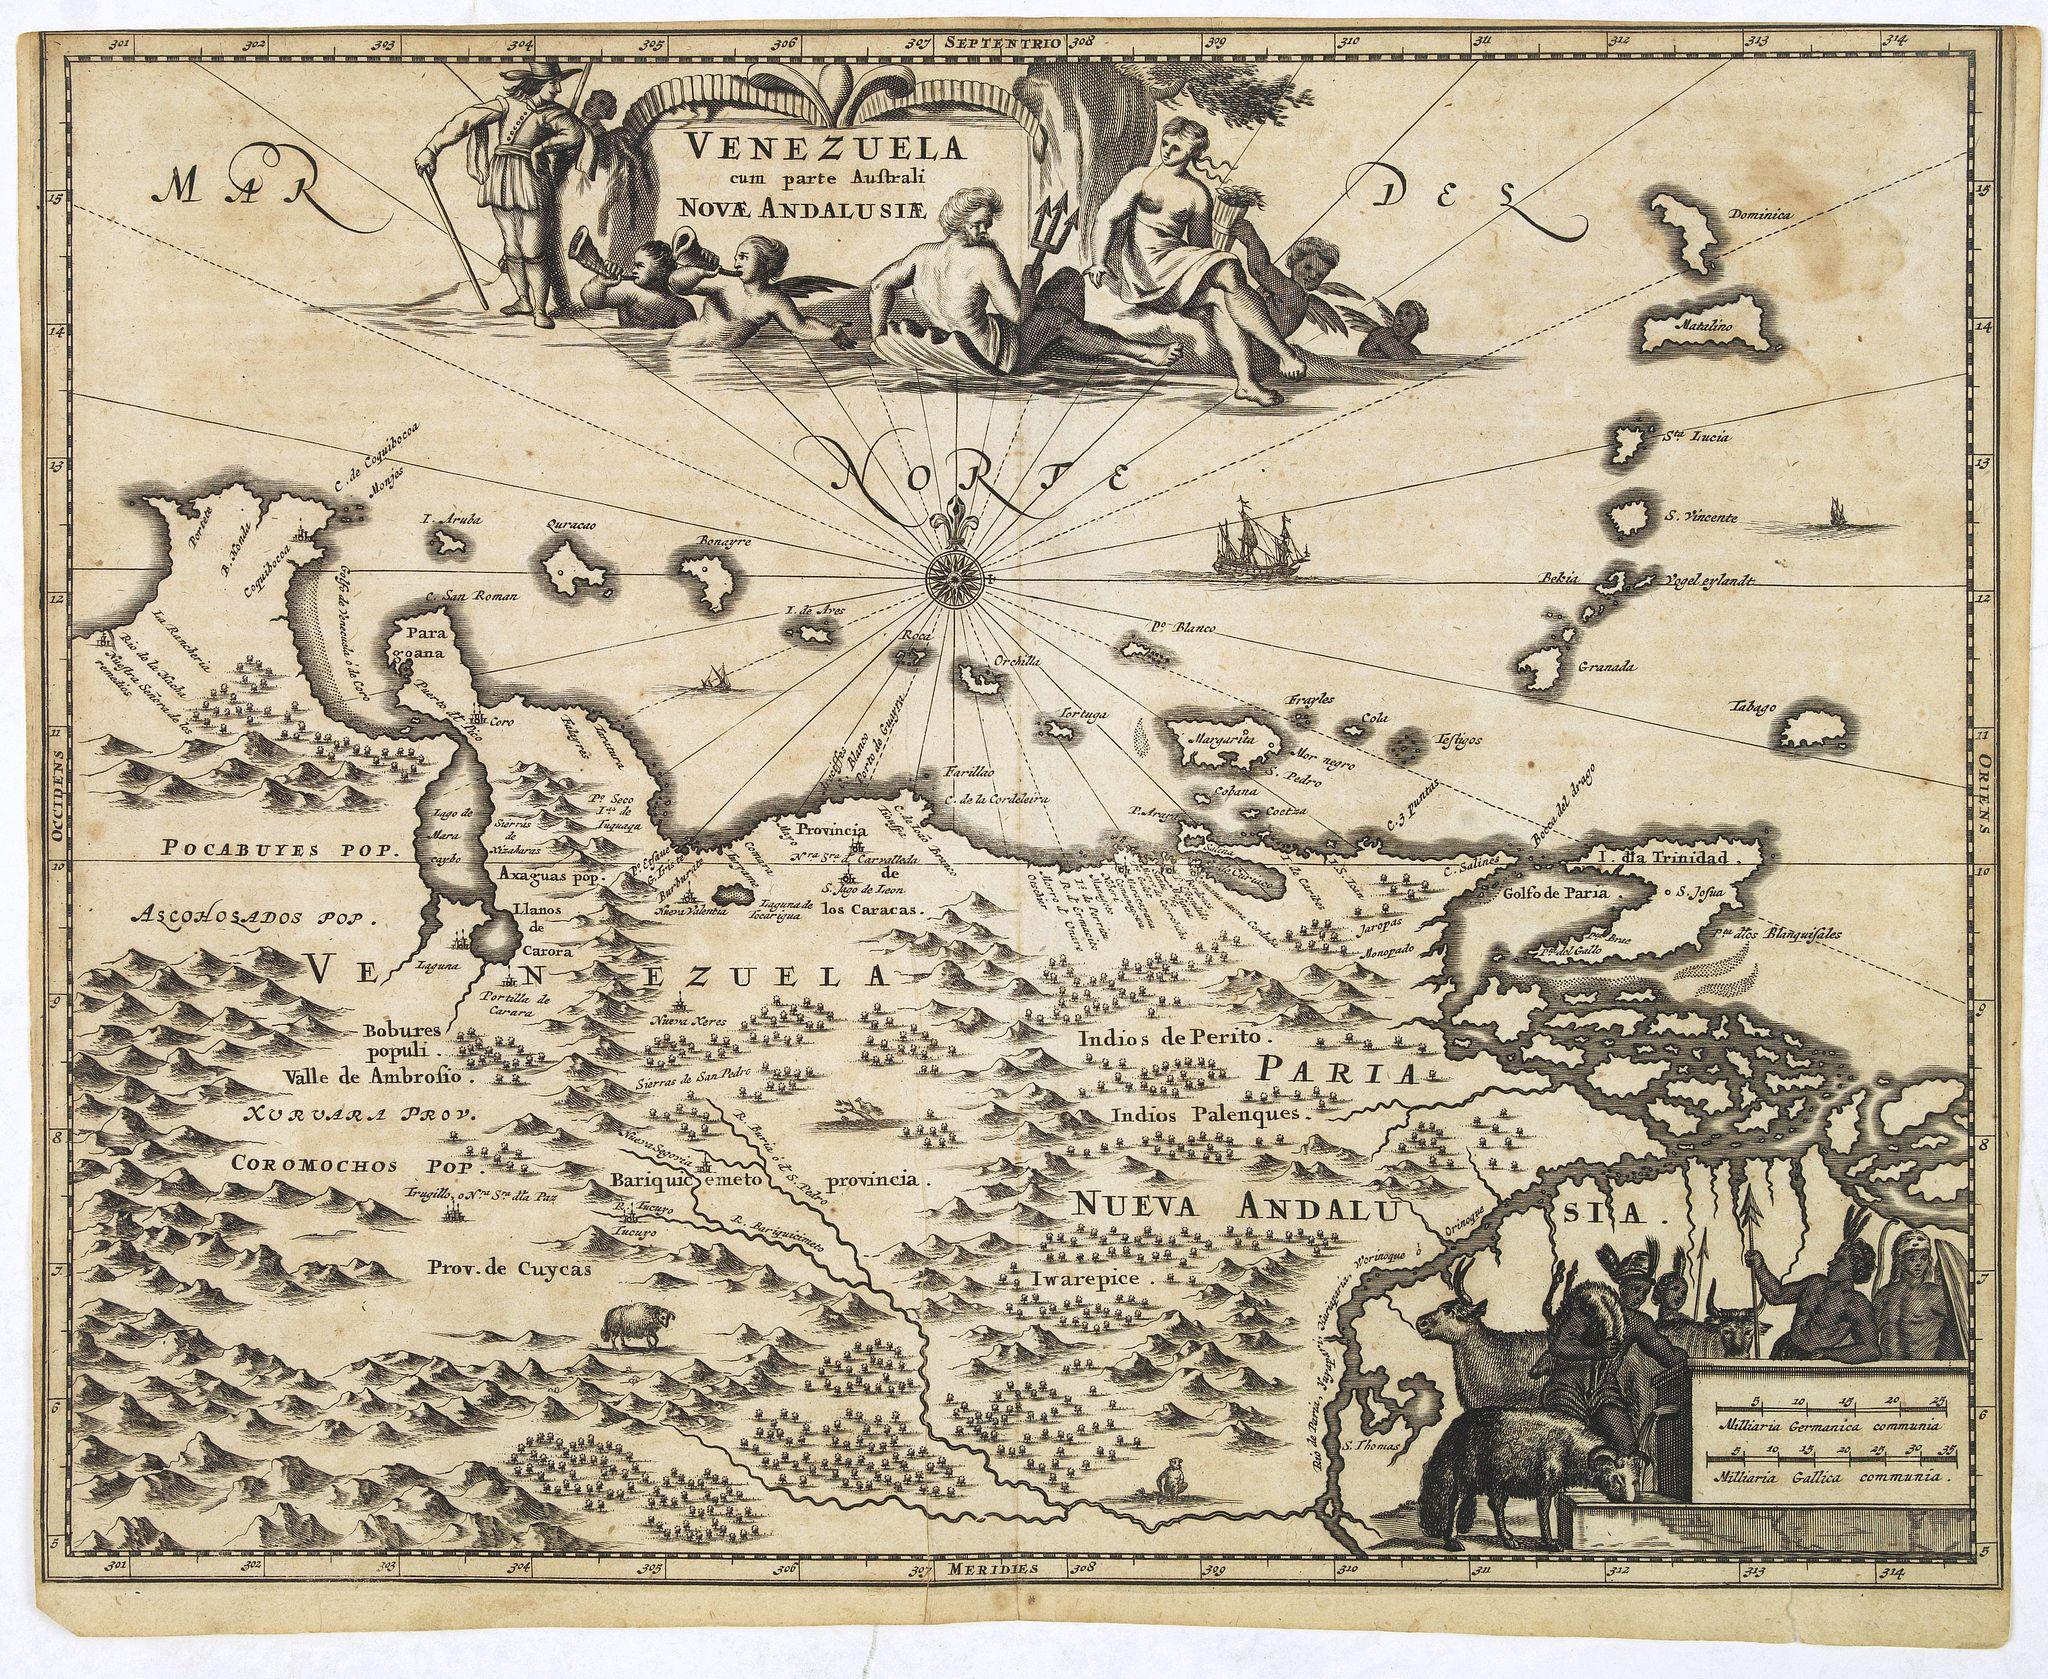 MONTANUS, A. -  Venezuela cum parte Australi Novae Andalusiae.